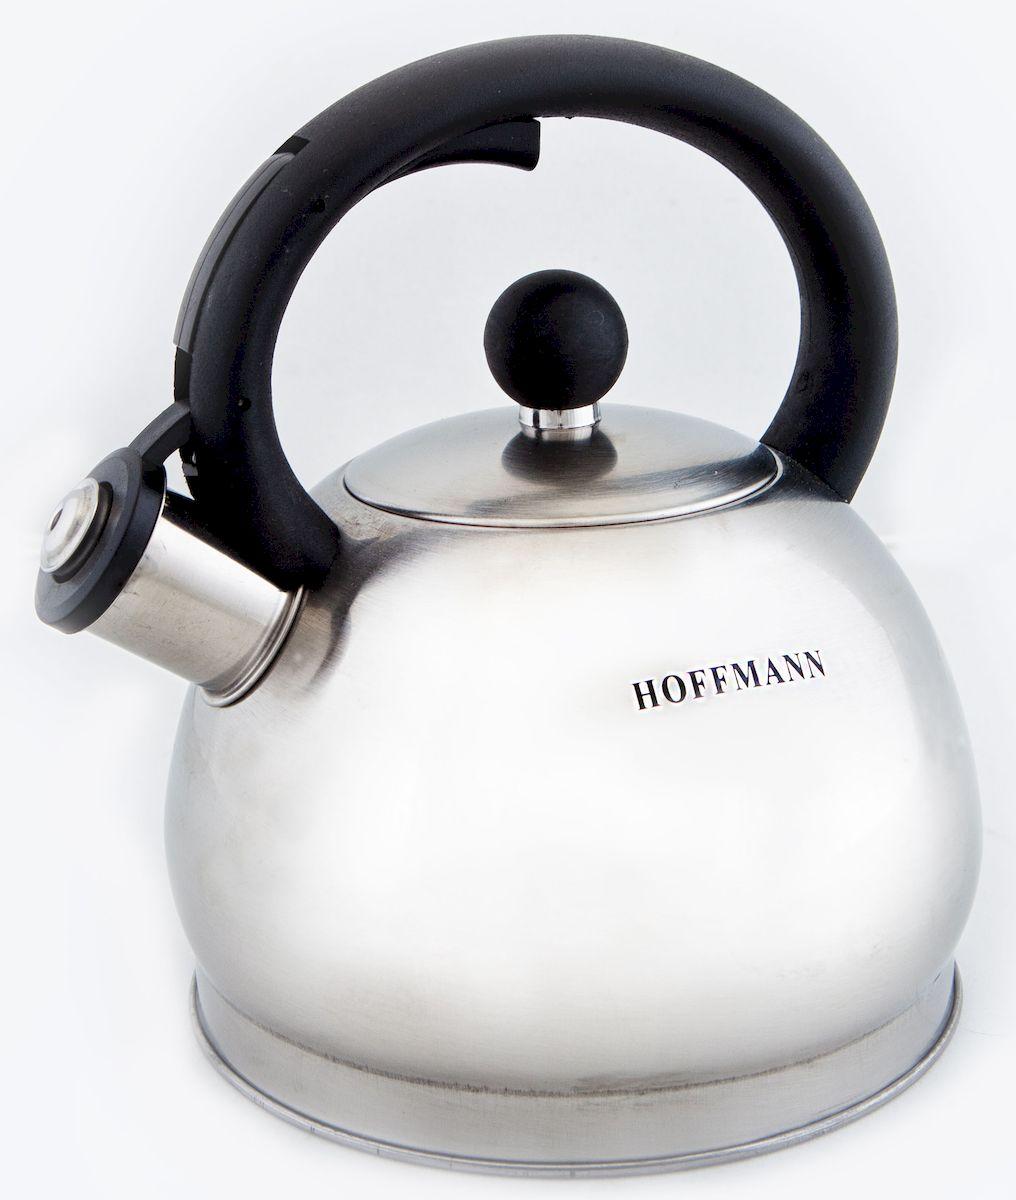 Чайник Hoffmann, со свистком, 2 л. НМ 5518НМ 5518